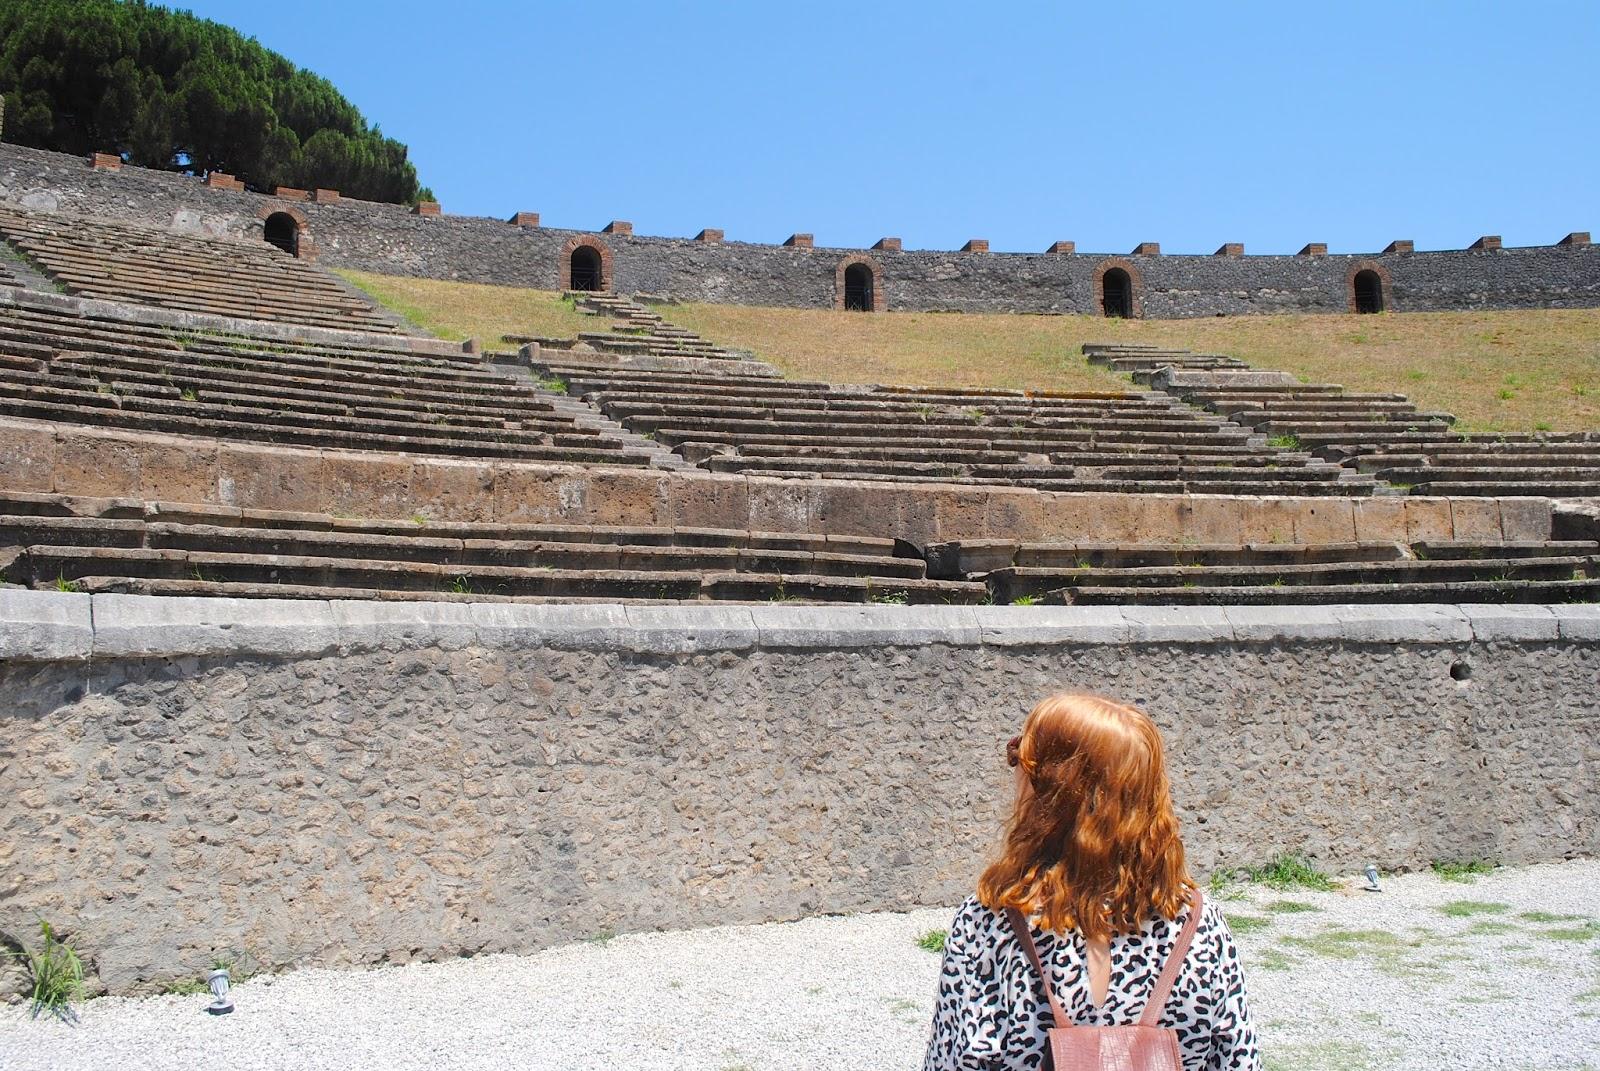 Amphitheater in Pompei Italy